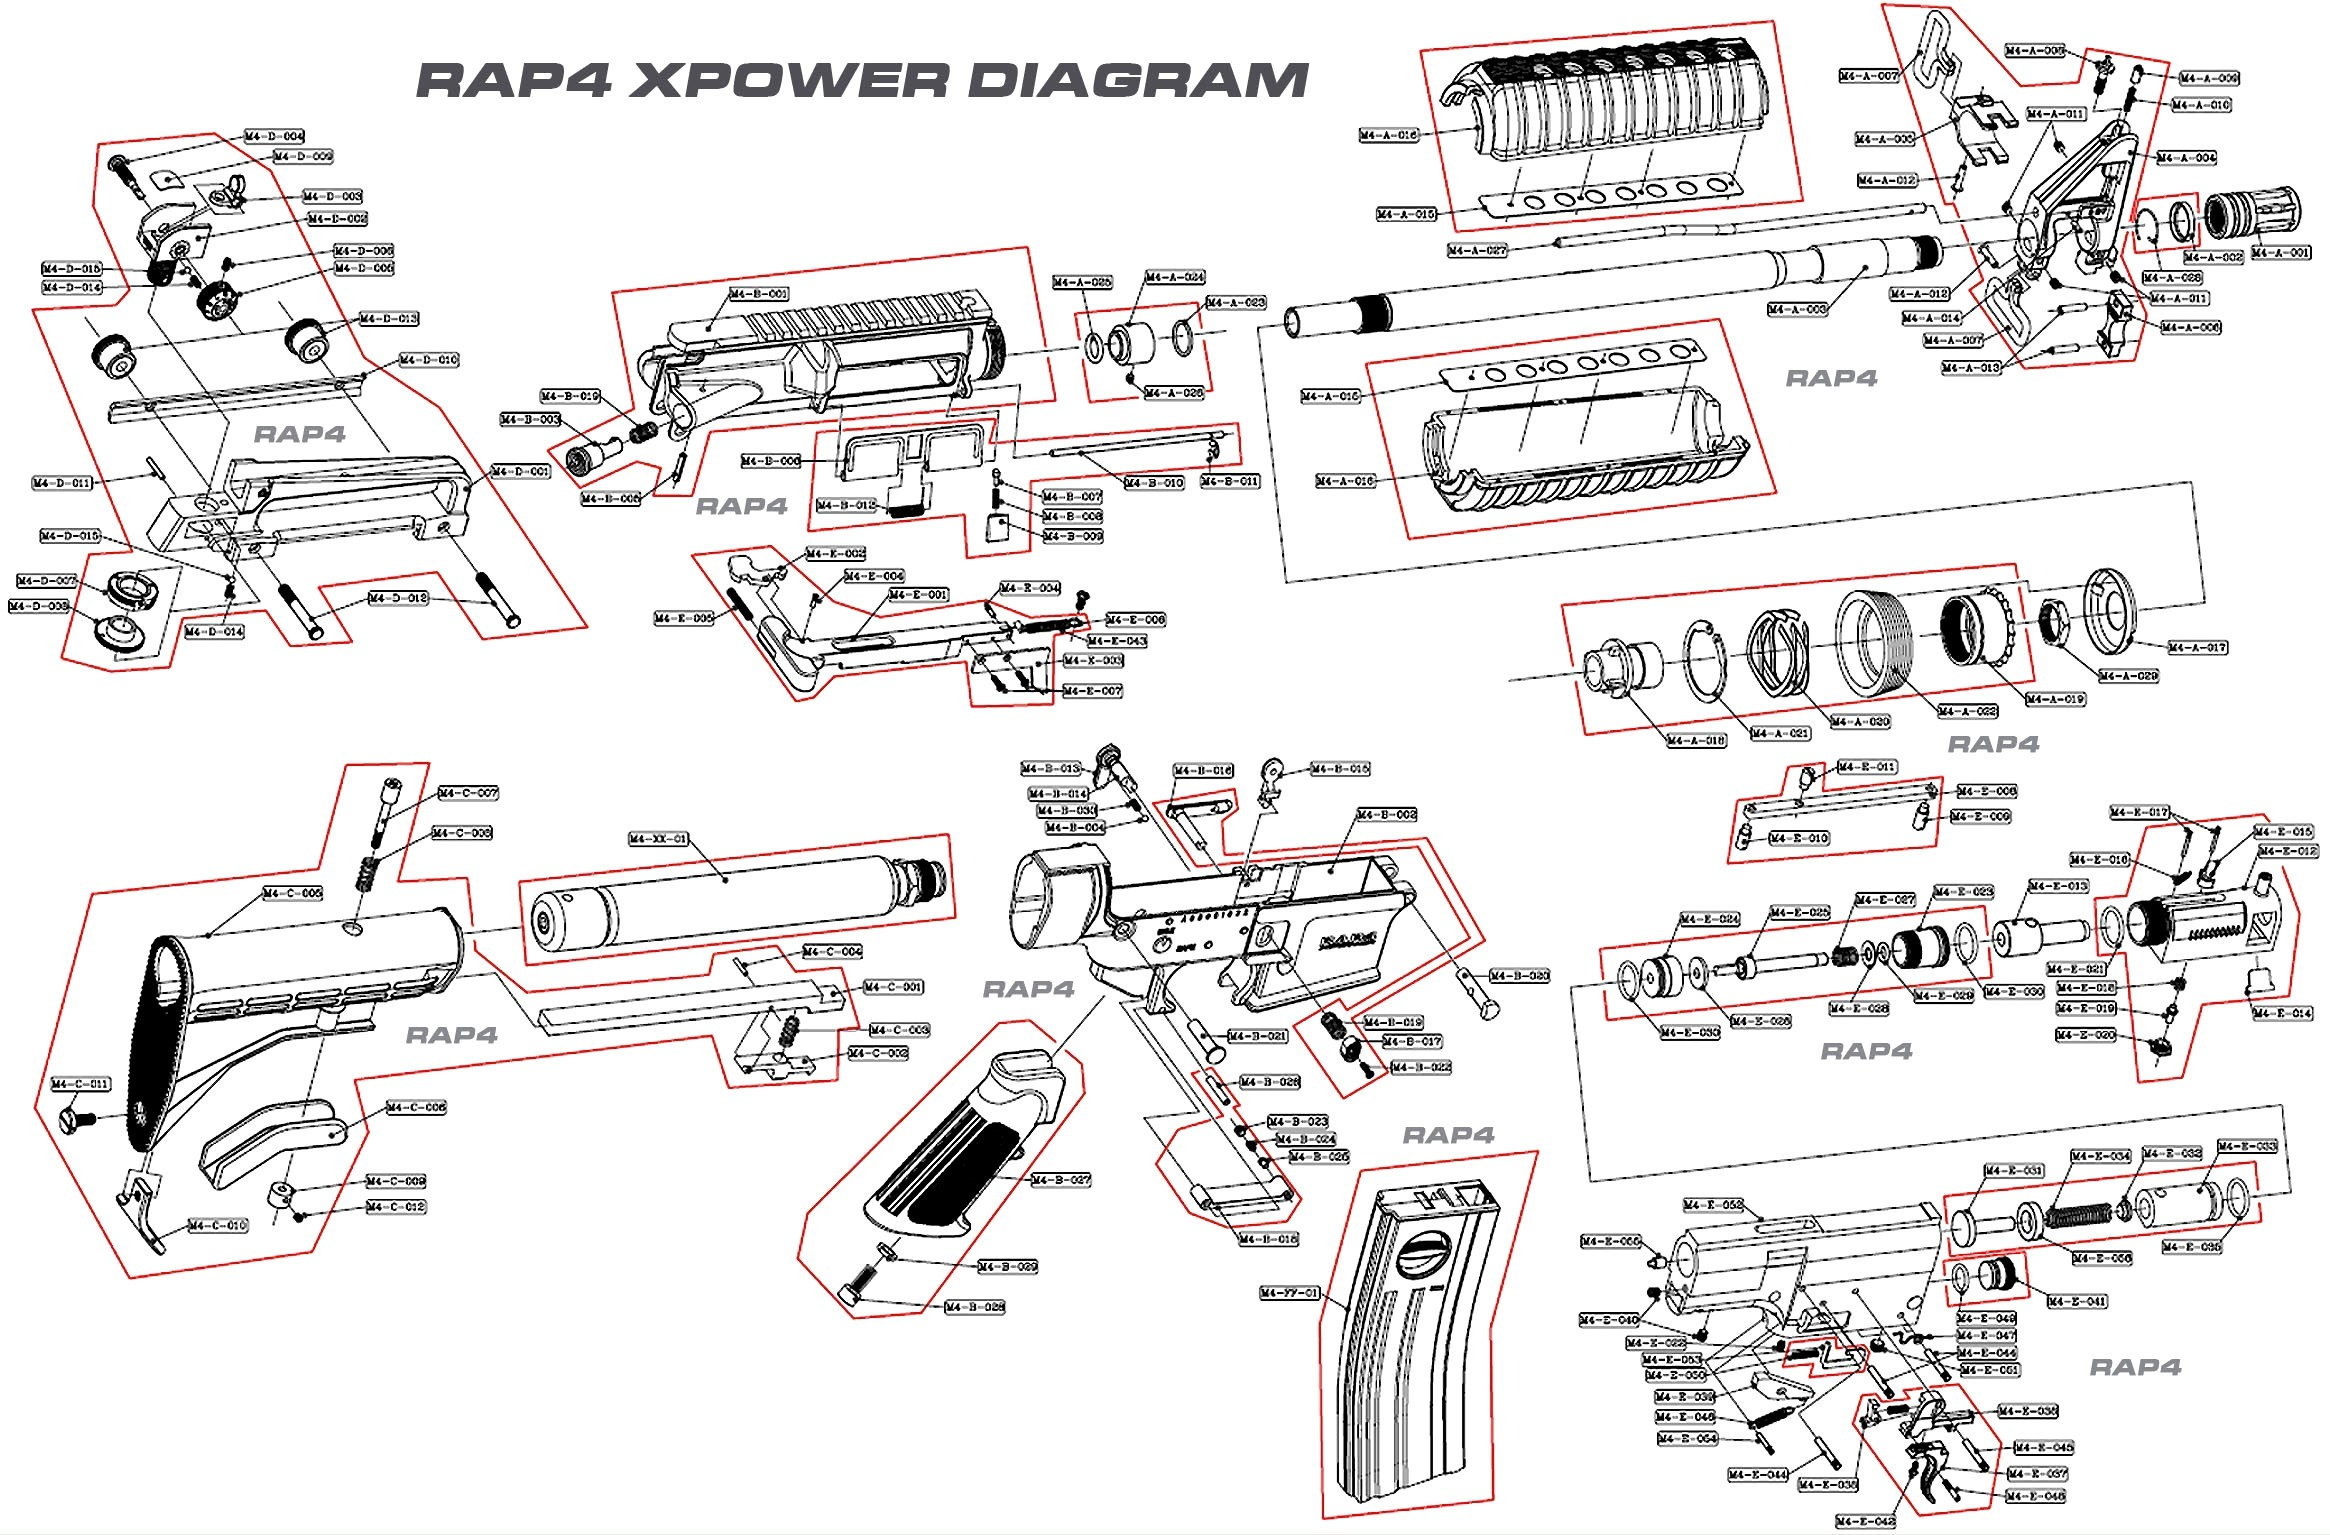 Car Body Parts Diagram 2018 Chevrolet Performance Parts Catalog Beautiful Chevy Van Parts Of Car Body Parts Diagram